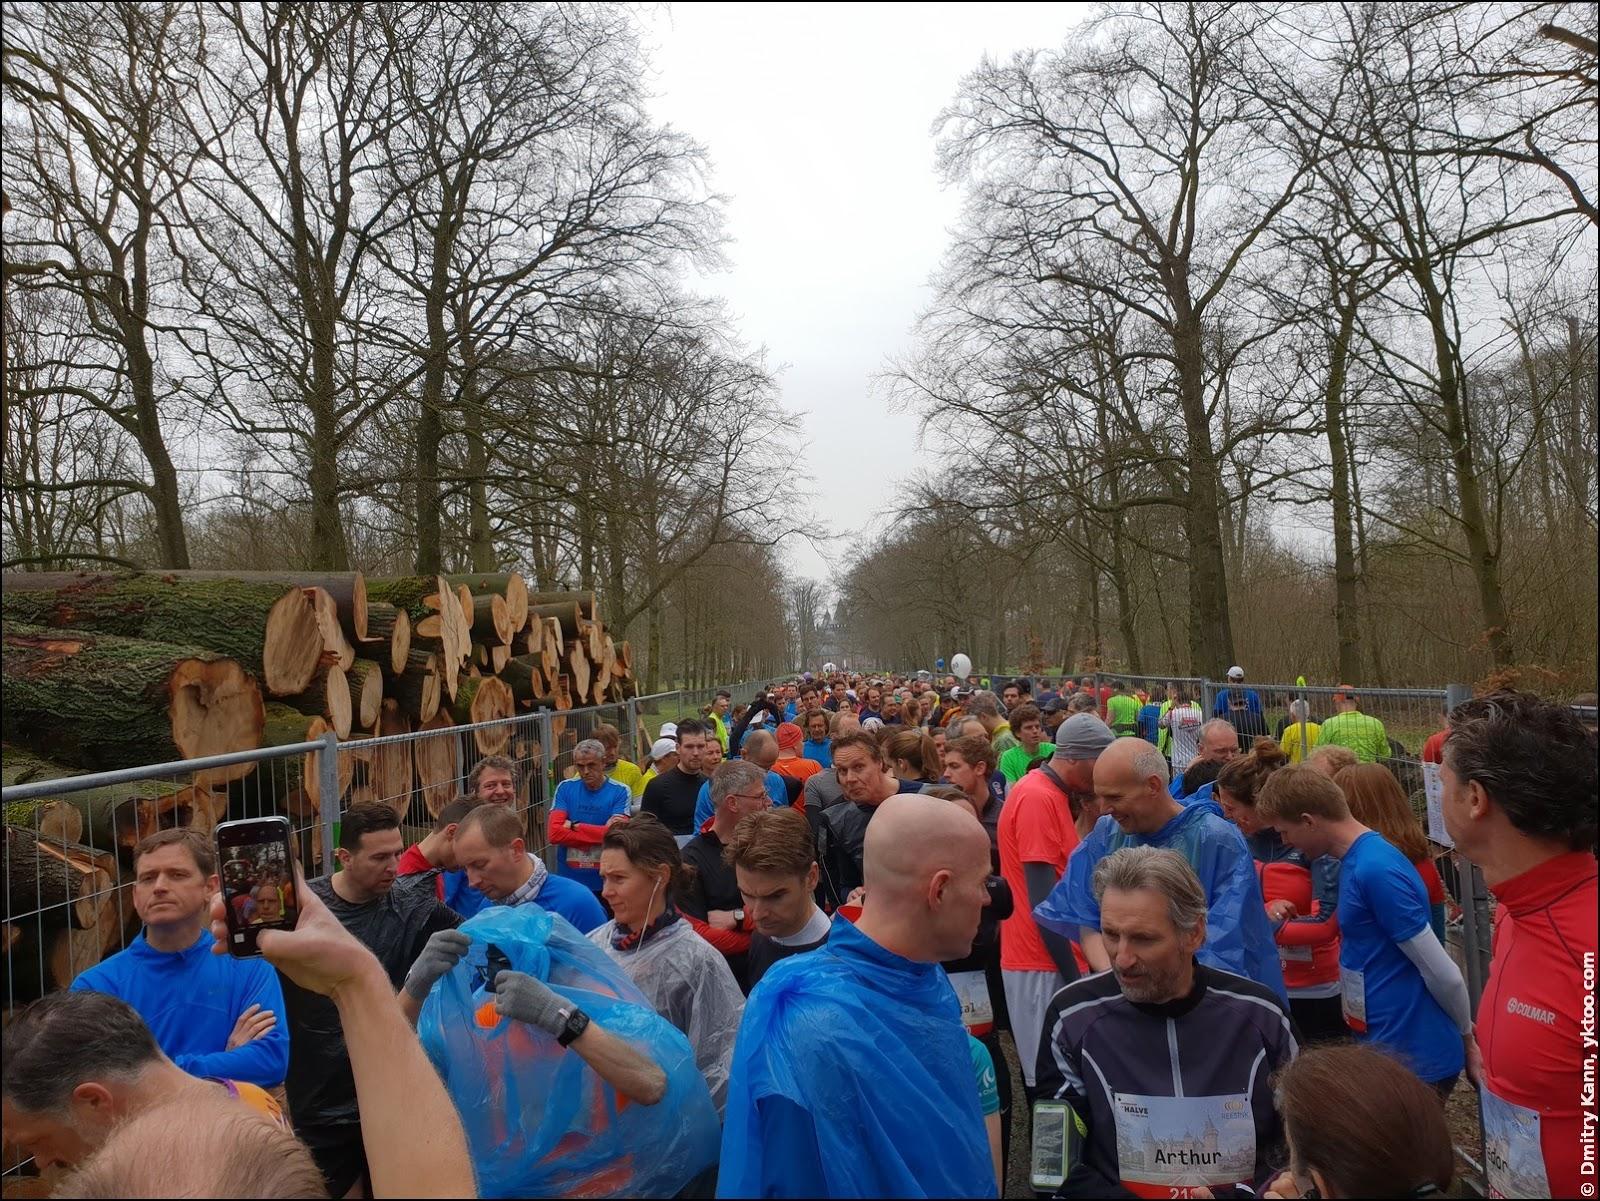 The start of the half marathon.